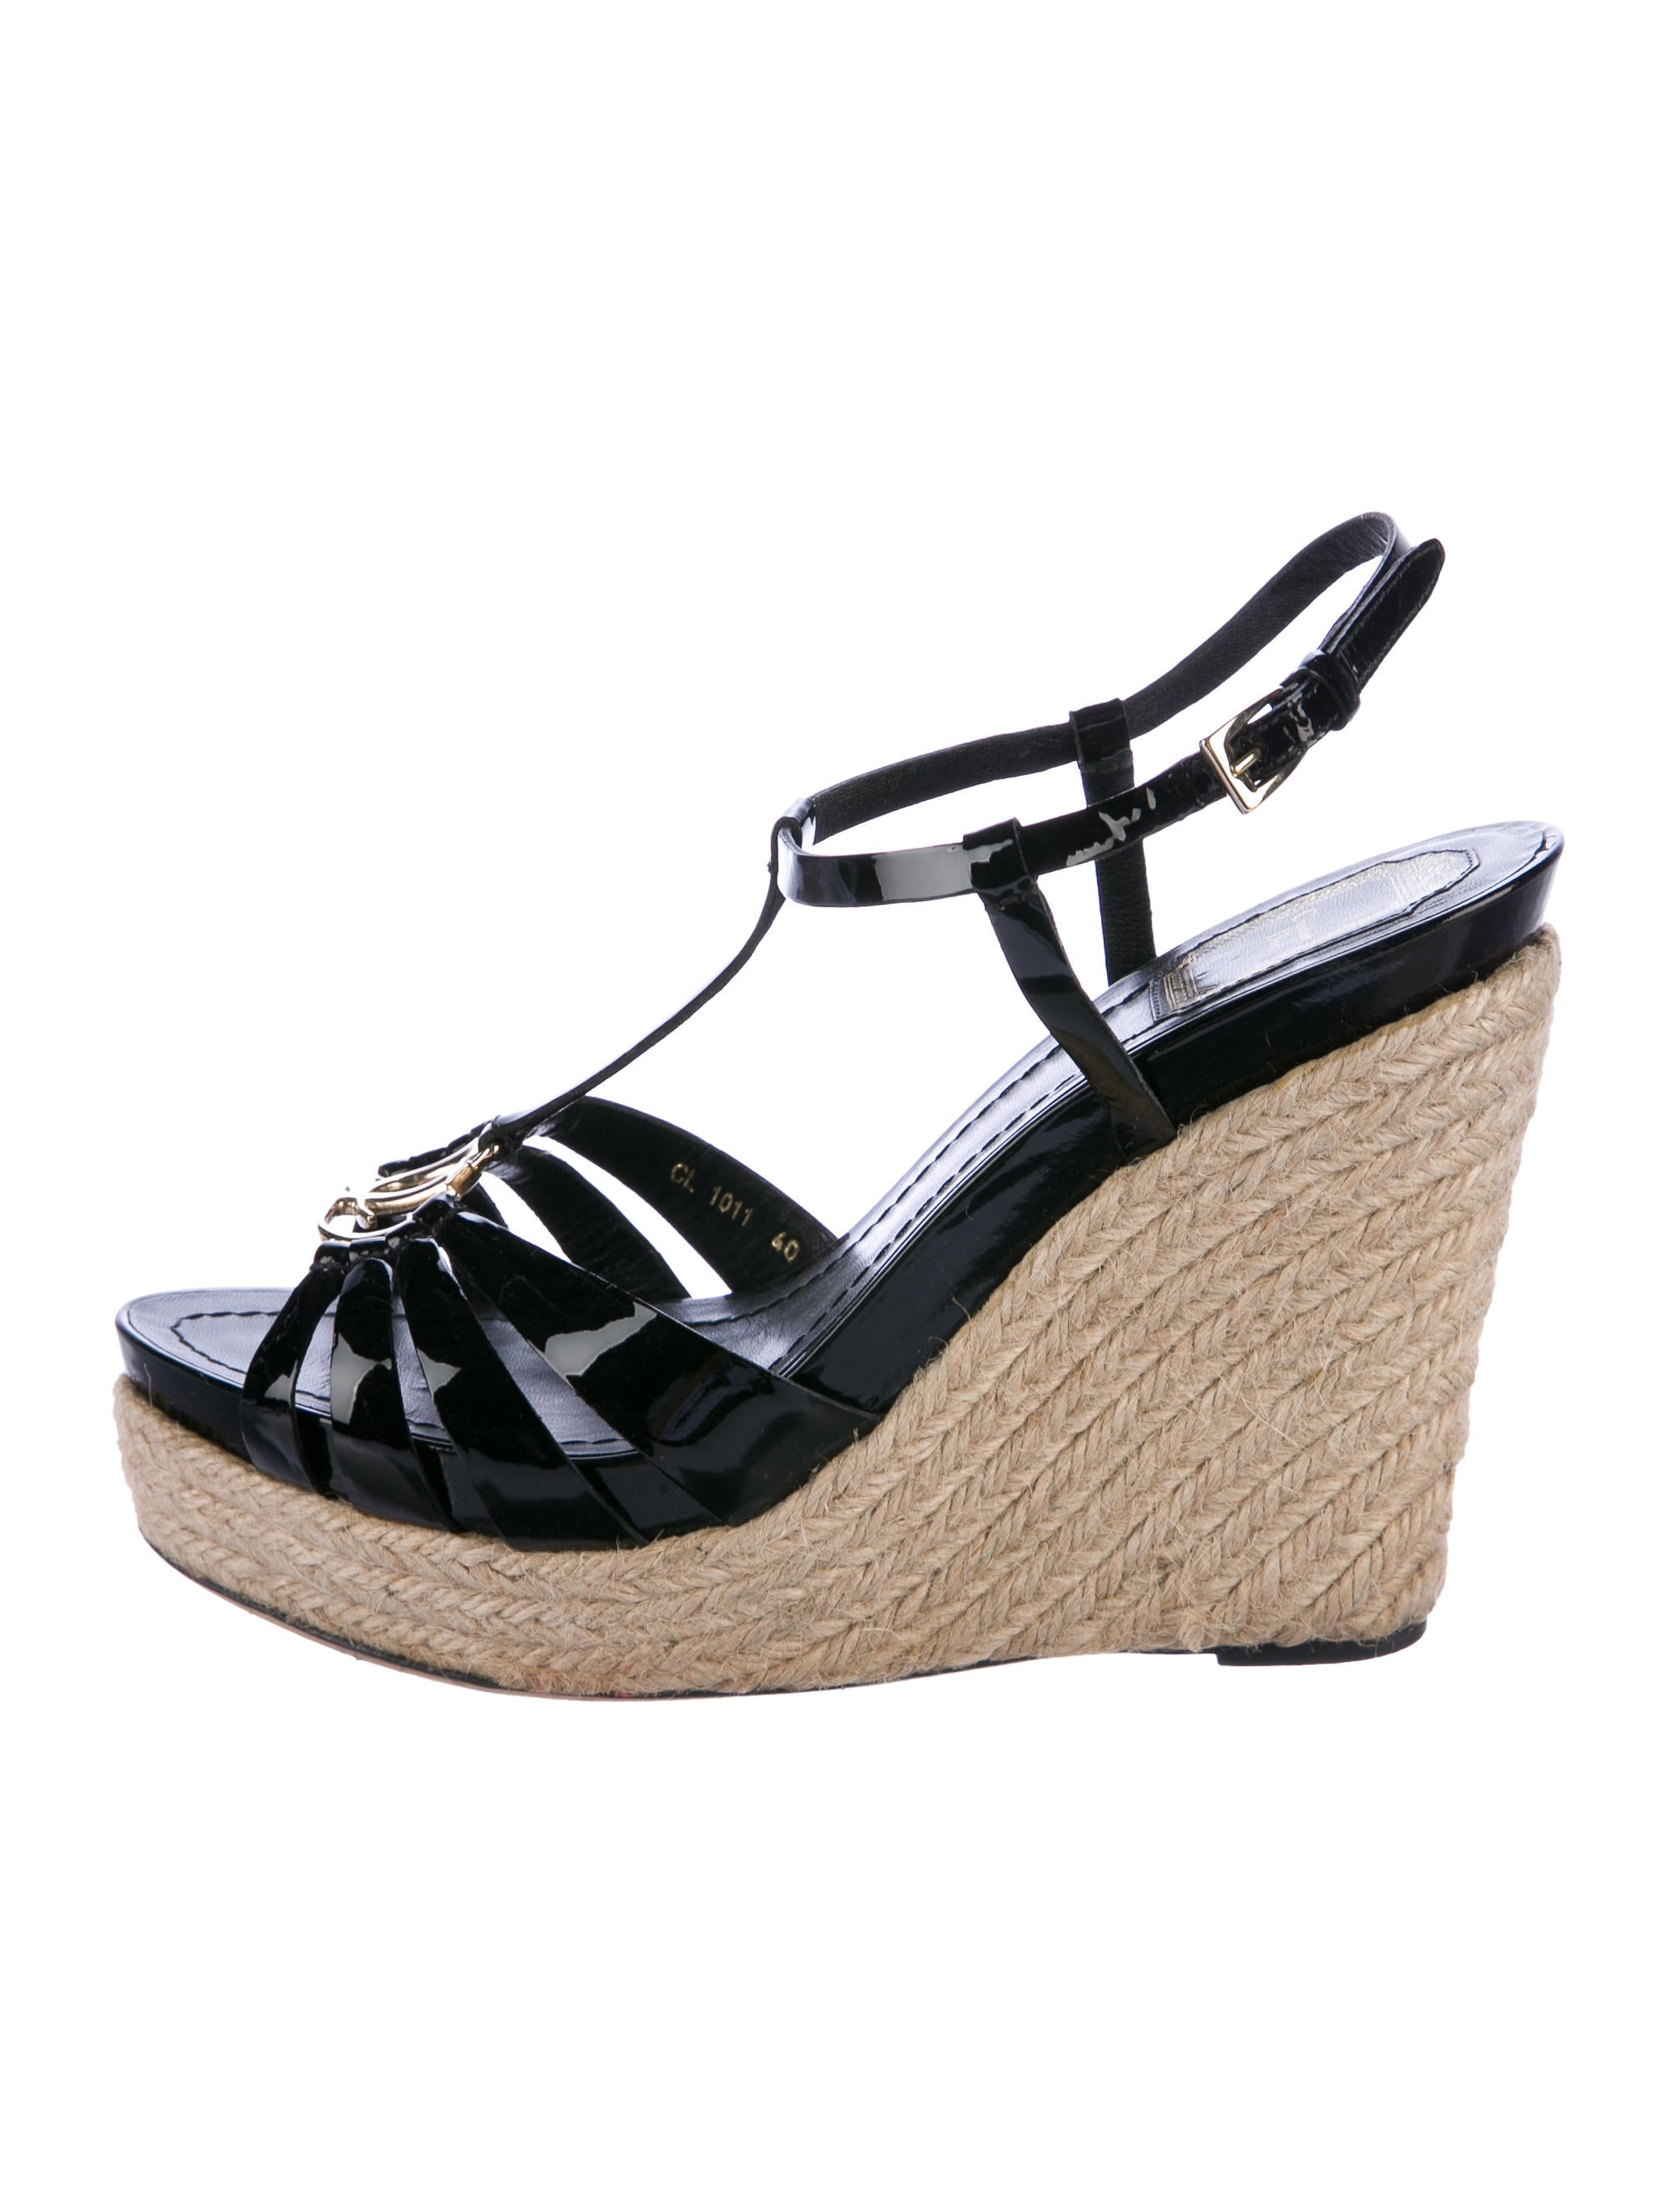 7f8bbab5cea712 Christian Dior Logo Platform Wedges - Shoes - CHR66277